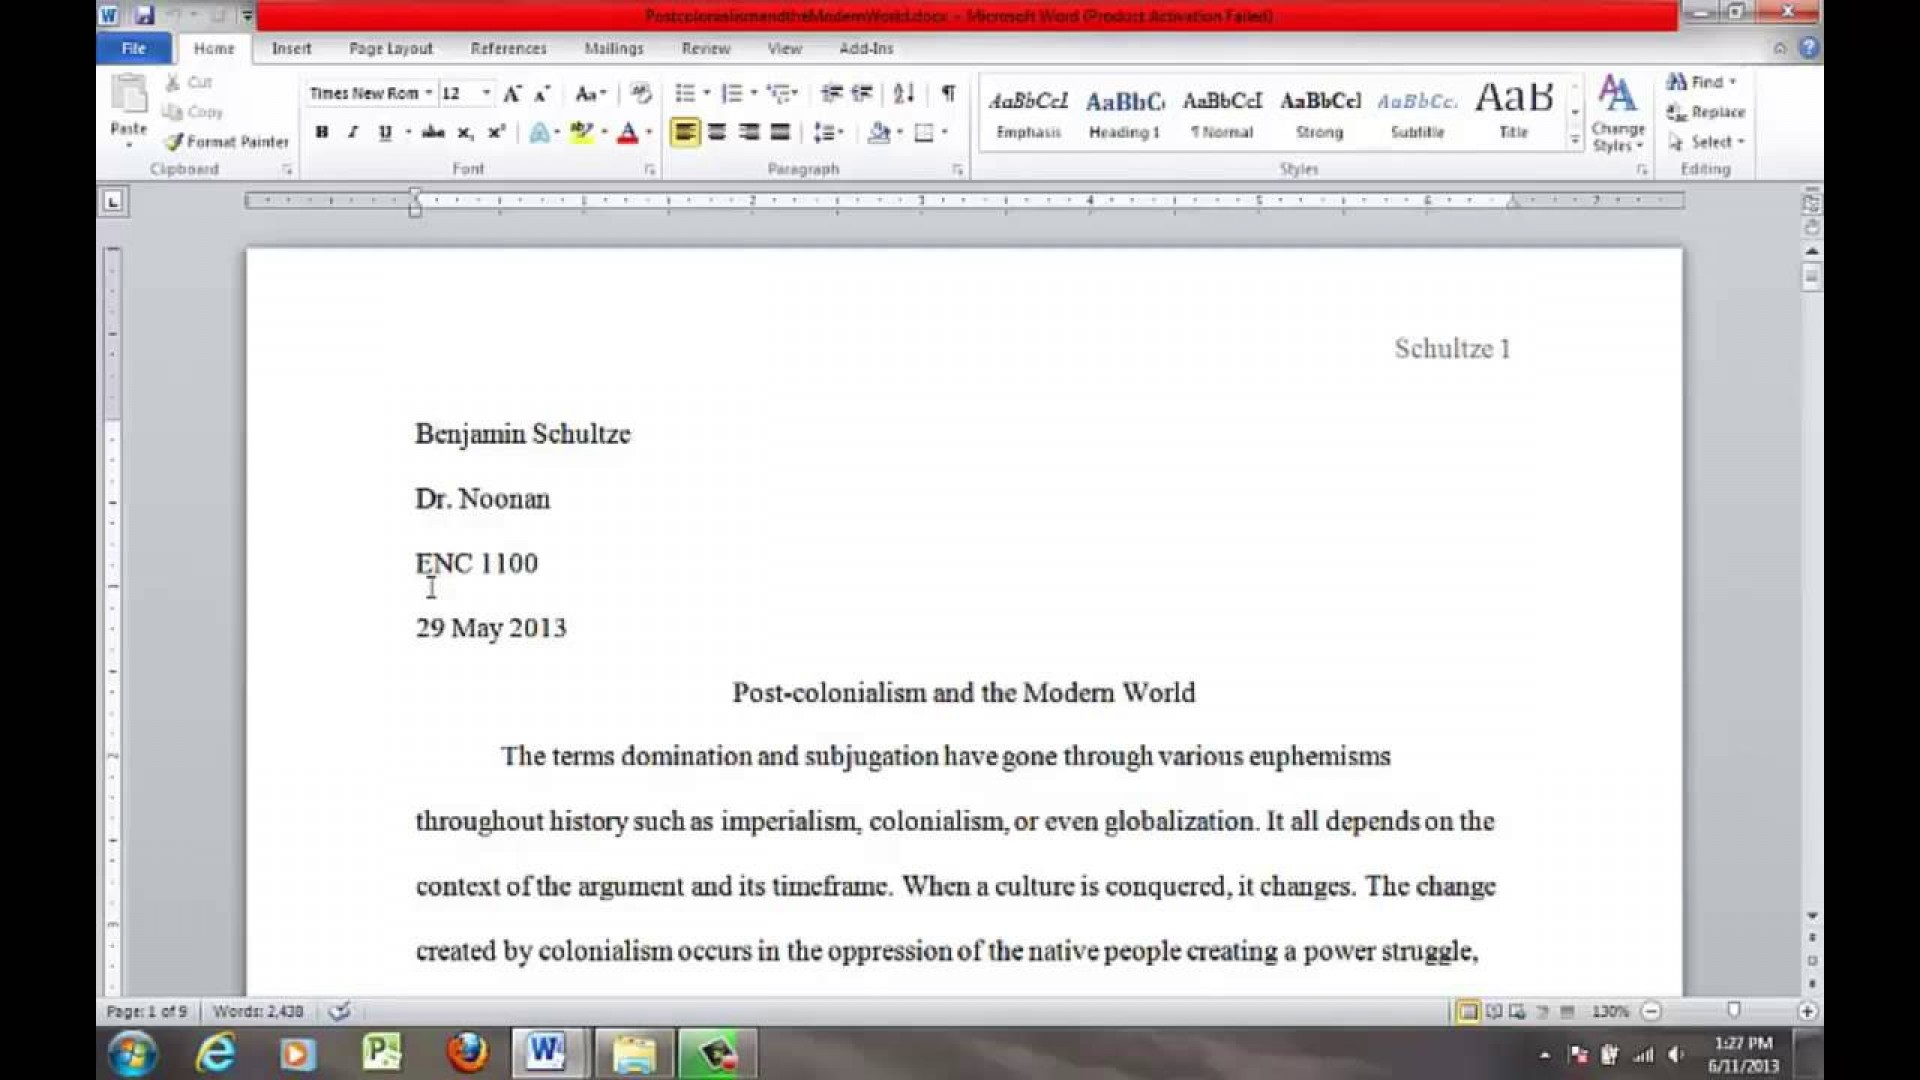 004 Proper Essay Heading Example Awesome Mla Writing 1920